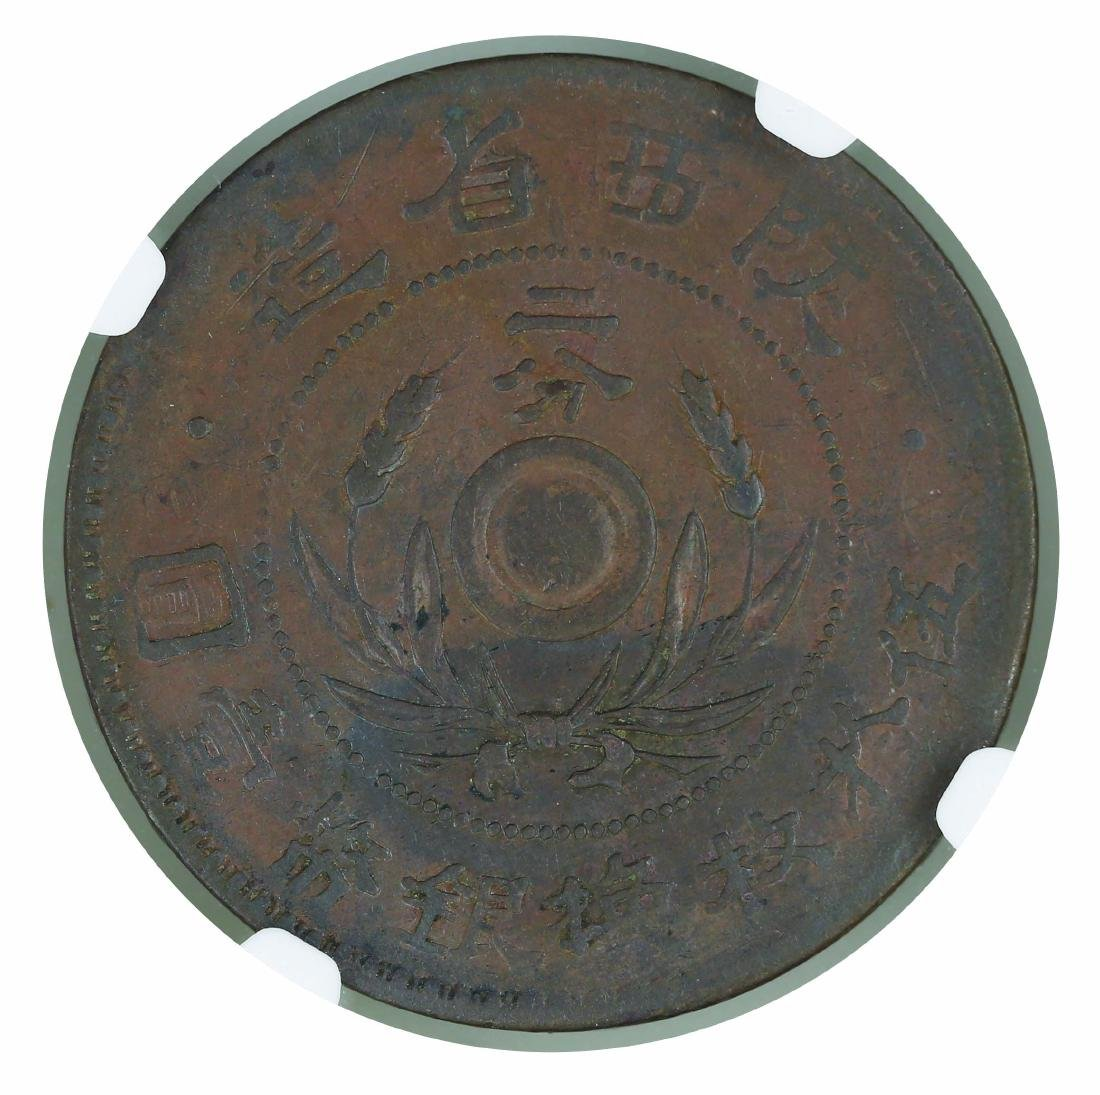 China-Shensi Province, 1928, 2 Cents